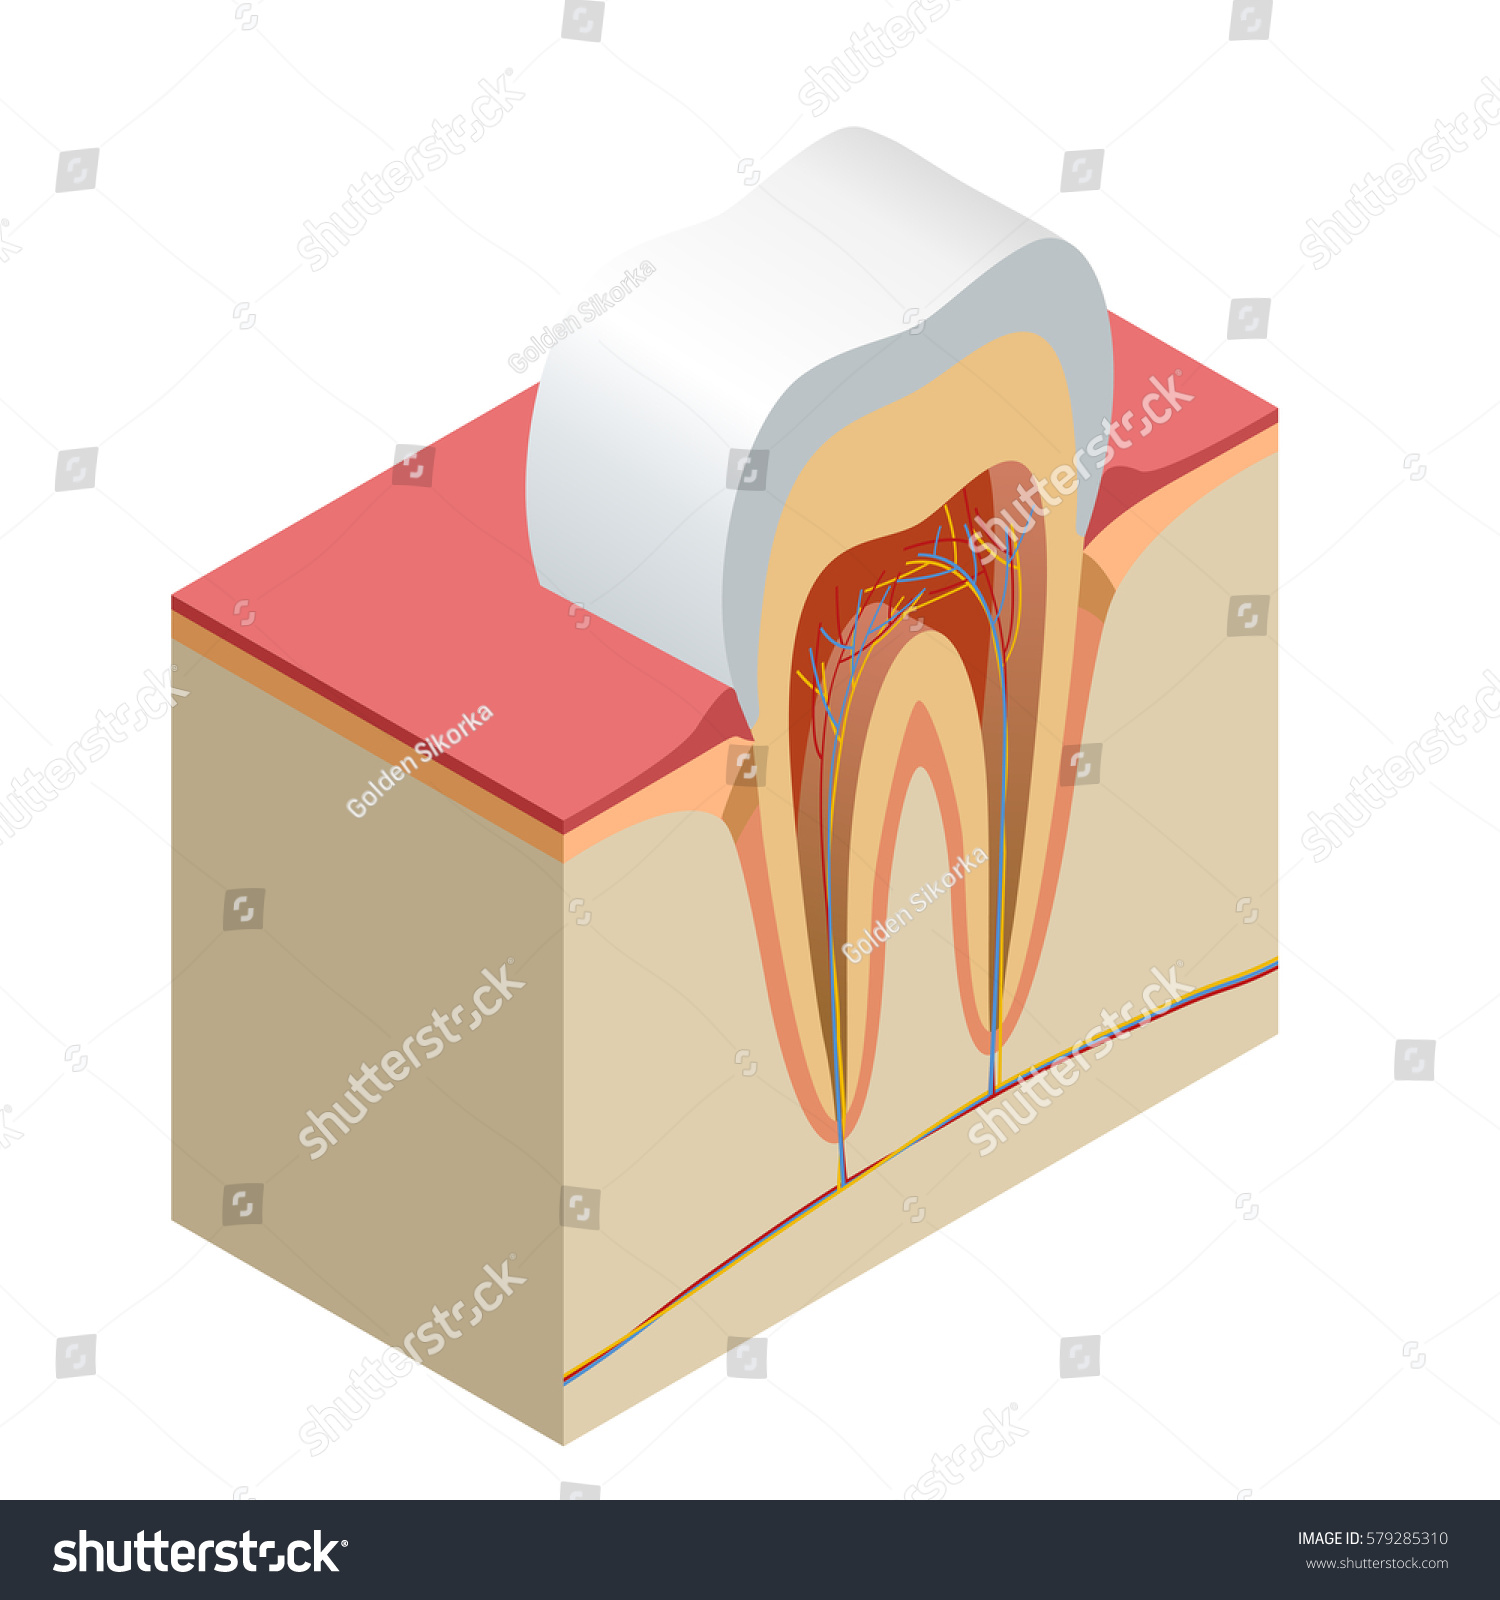 Isometric Real Tooth Anatomy Closeup Cut Stock Illustration